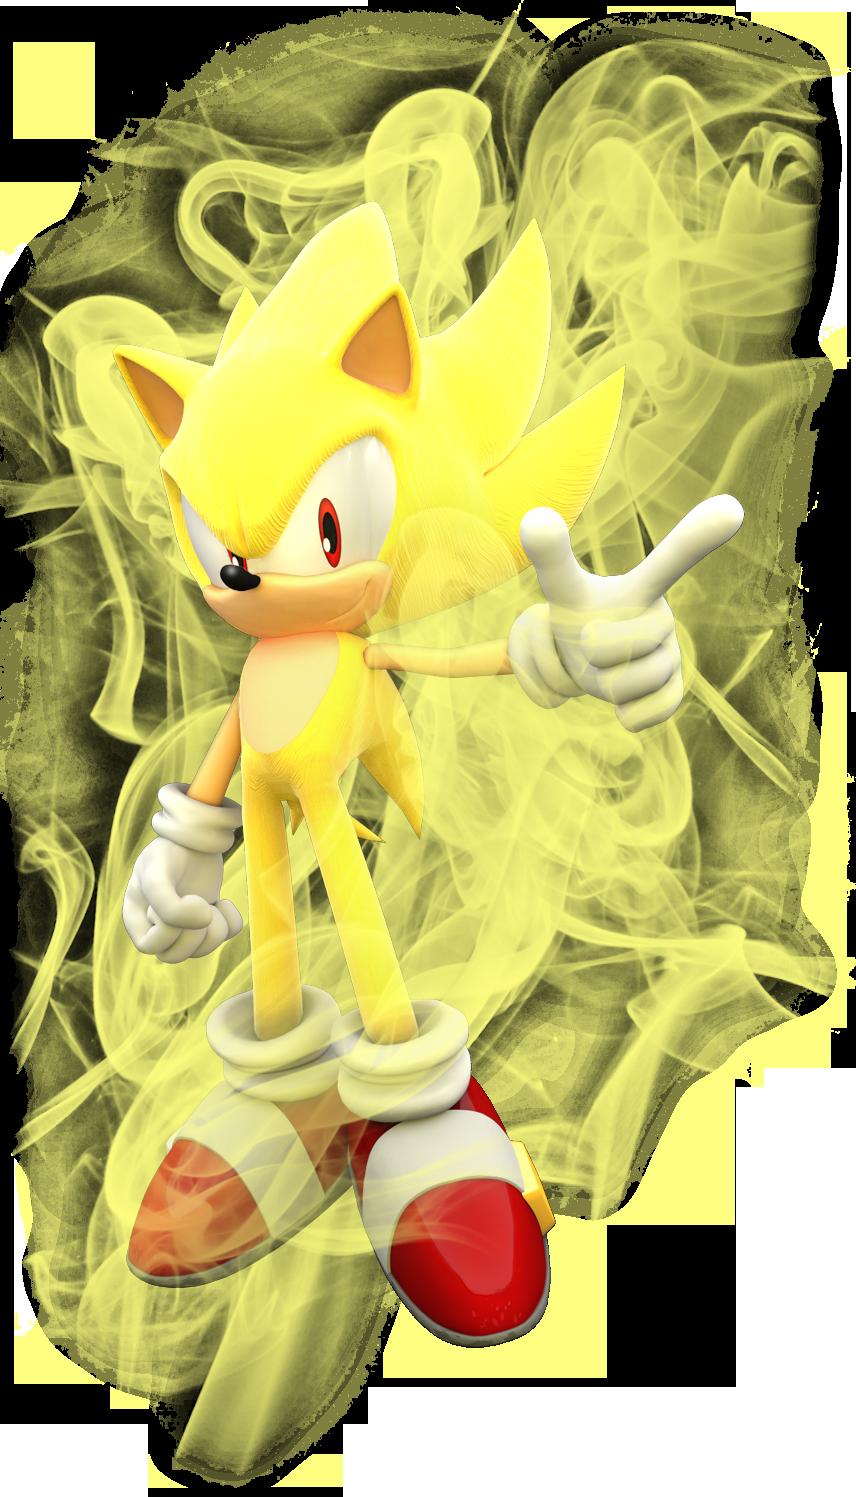 Super sonic sonic fanon wiki fandom powered by wikia - Sonic et shadow ...